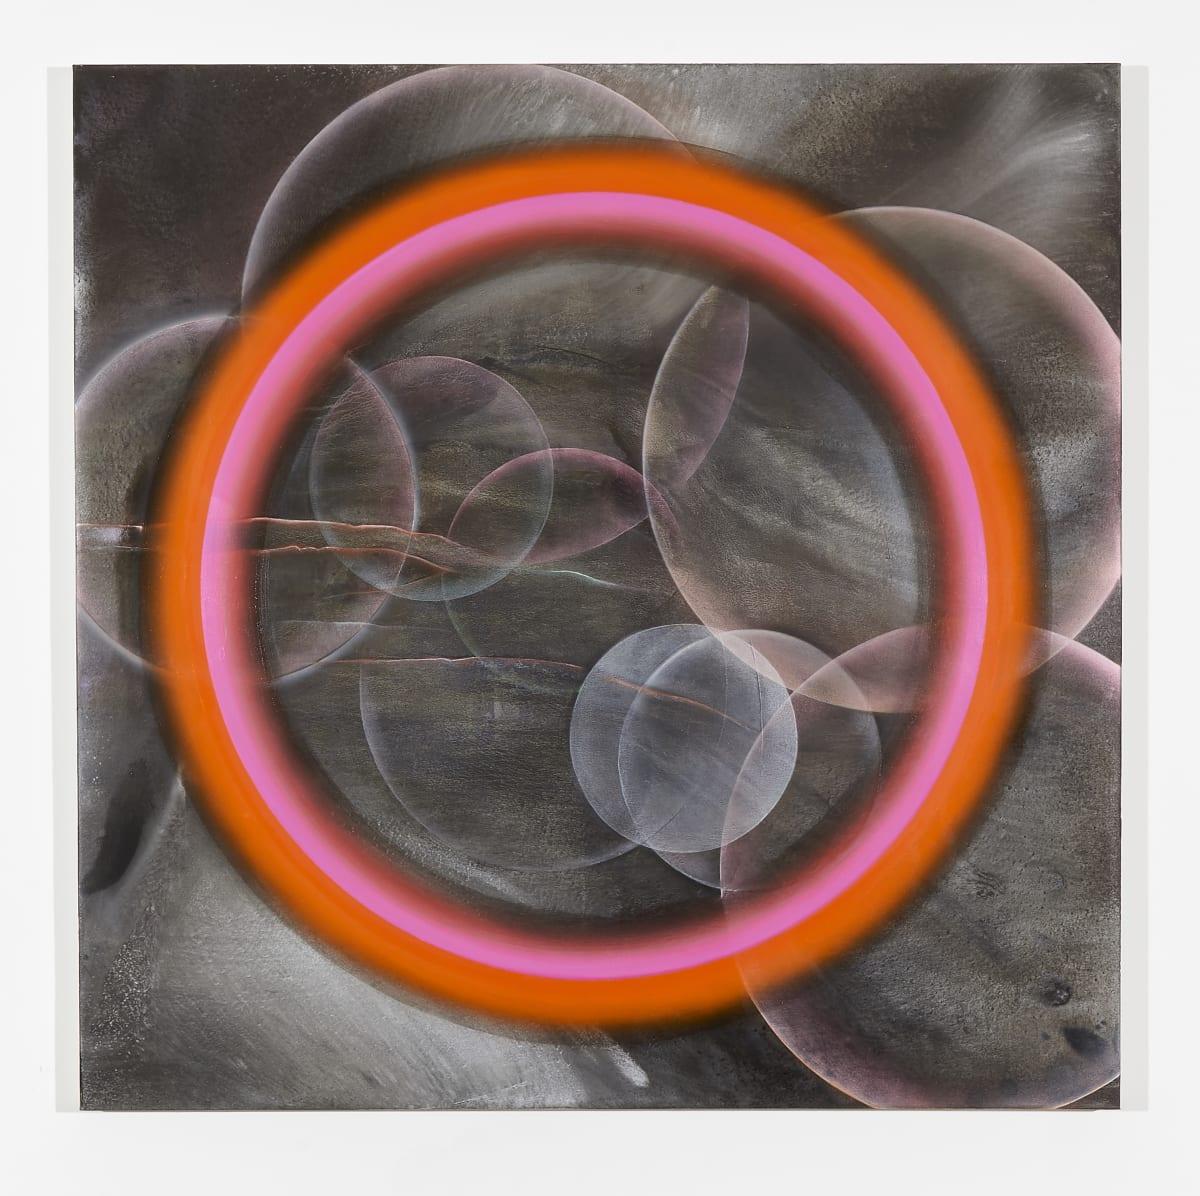 Marion Borgelt Exploding Stars with Binary Halo, 2019 oil, acrylic on canvas 120 x 120 cm